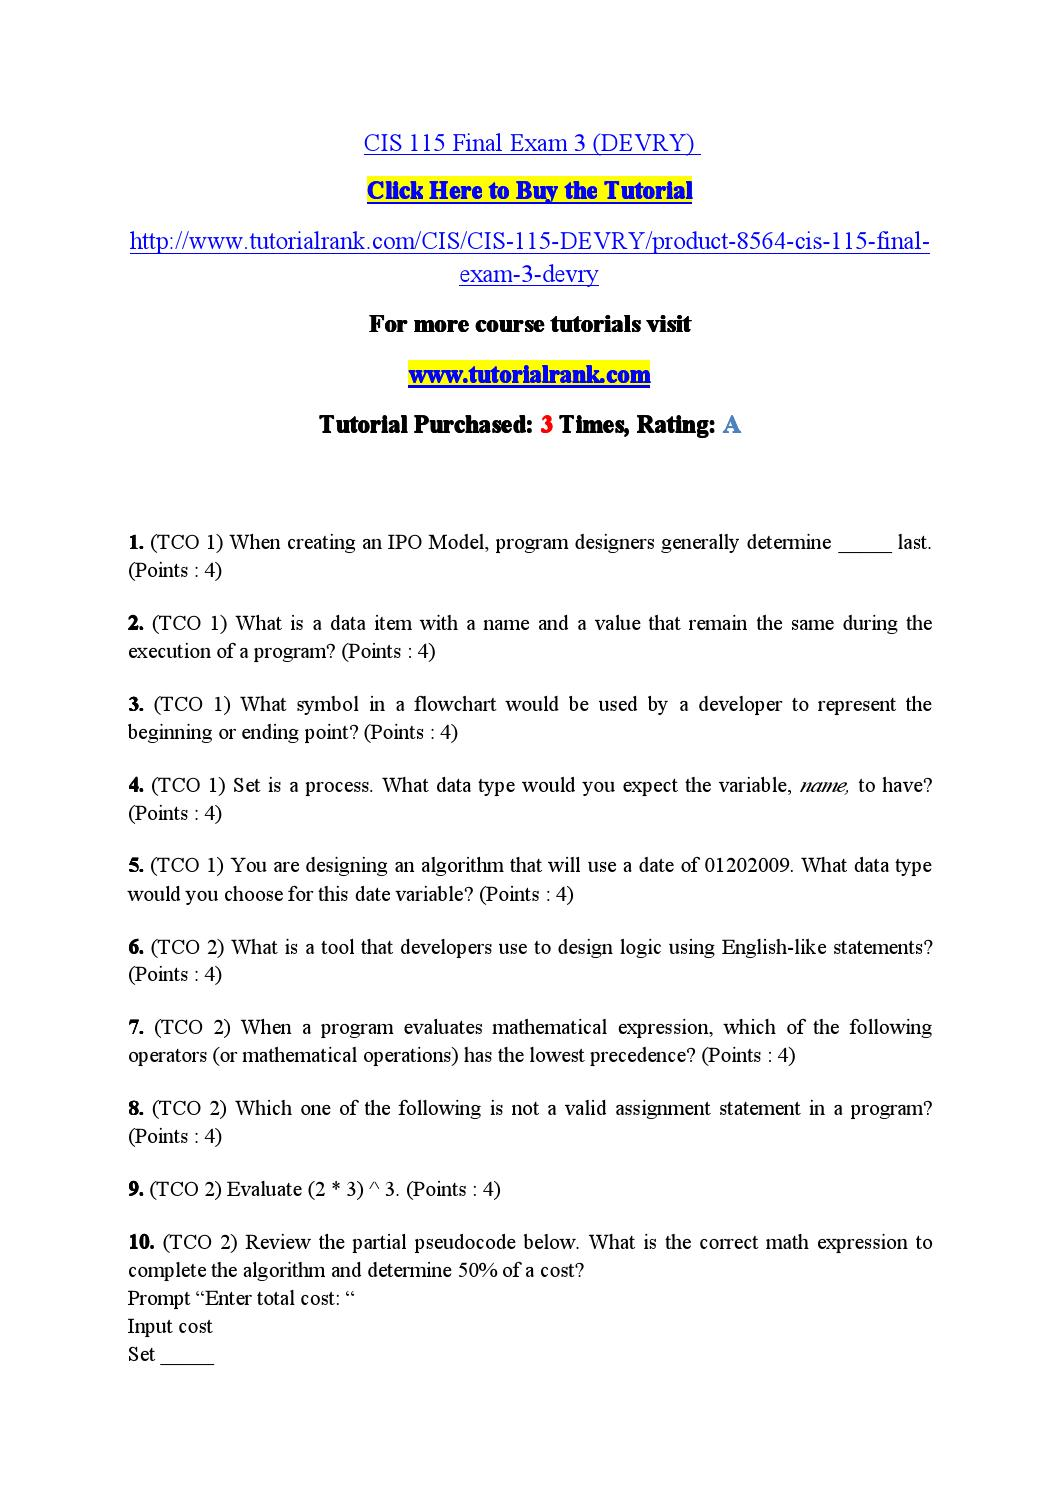 Cis 115 final exam 3 by channel27 issuu biocorpaavc Gallery